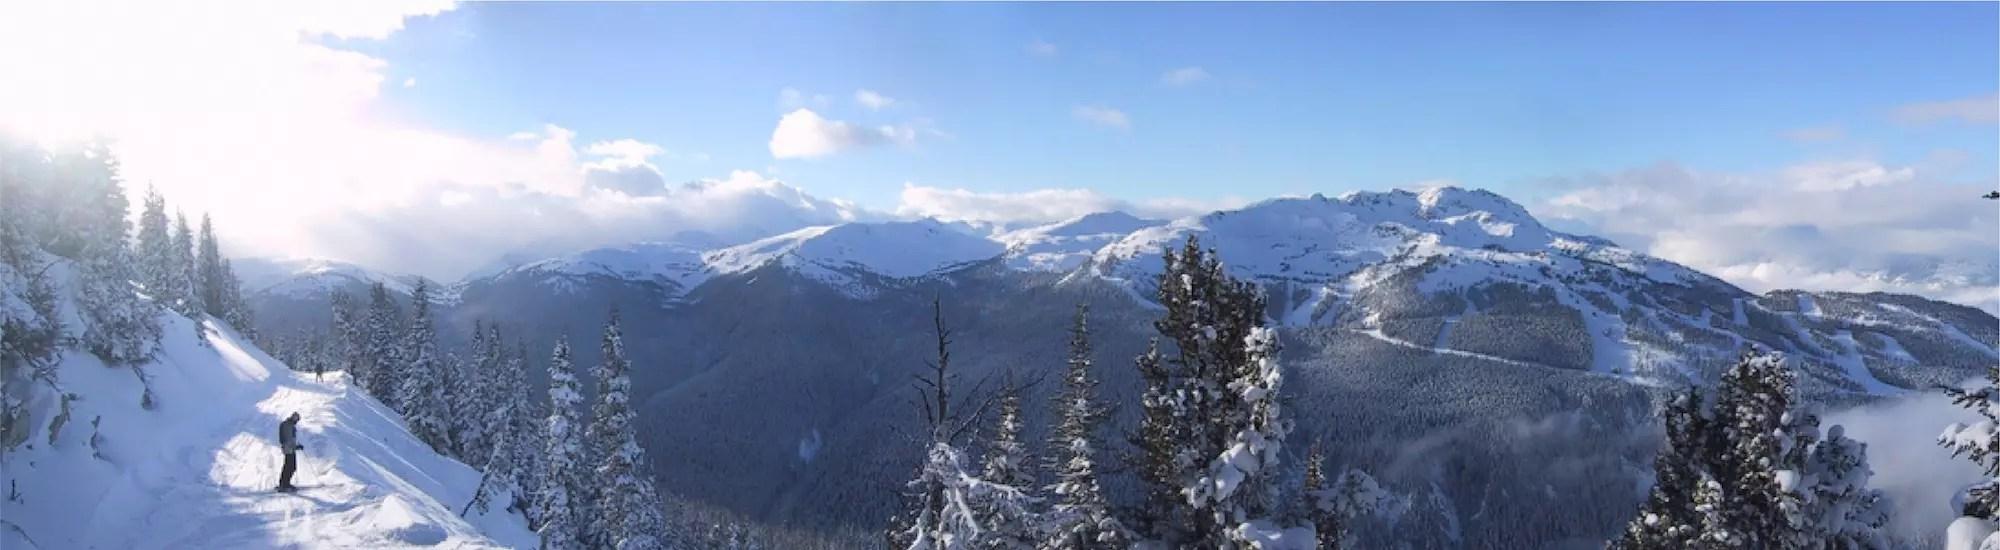 SWSPD Winter Ski Meeting